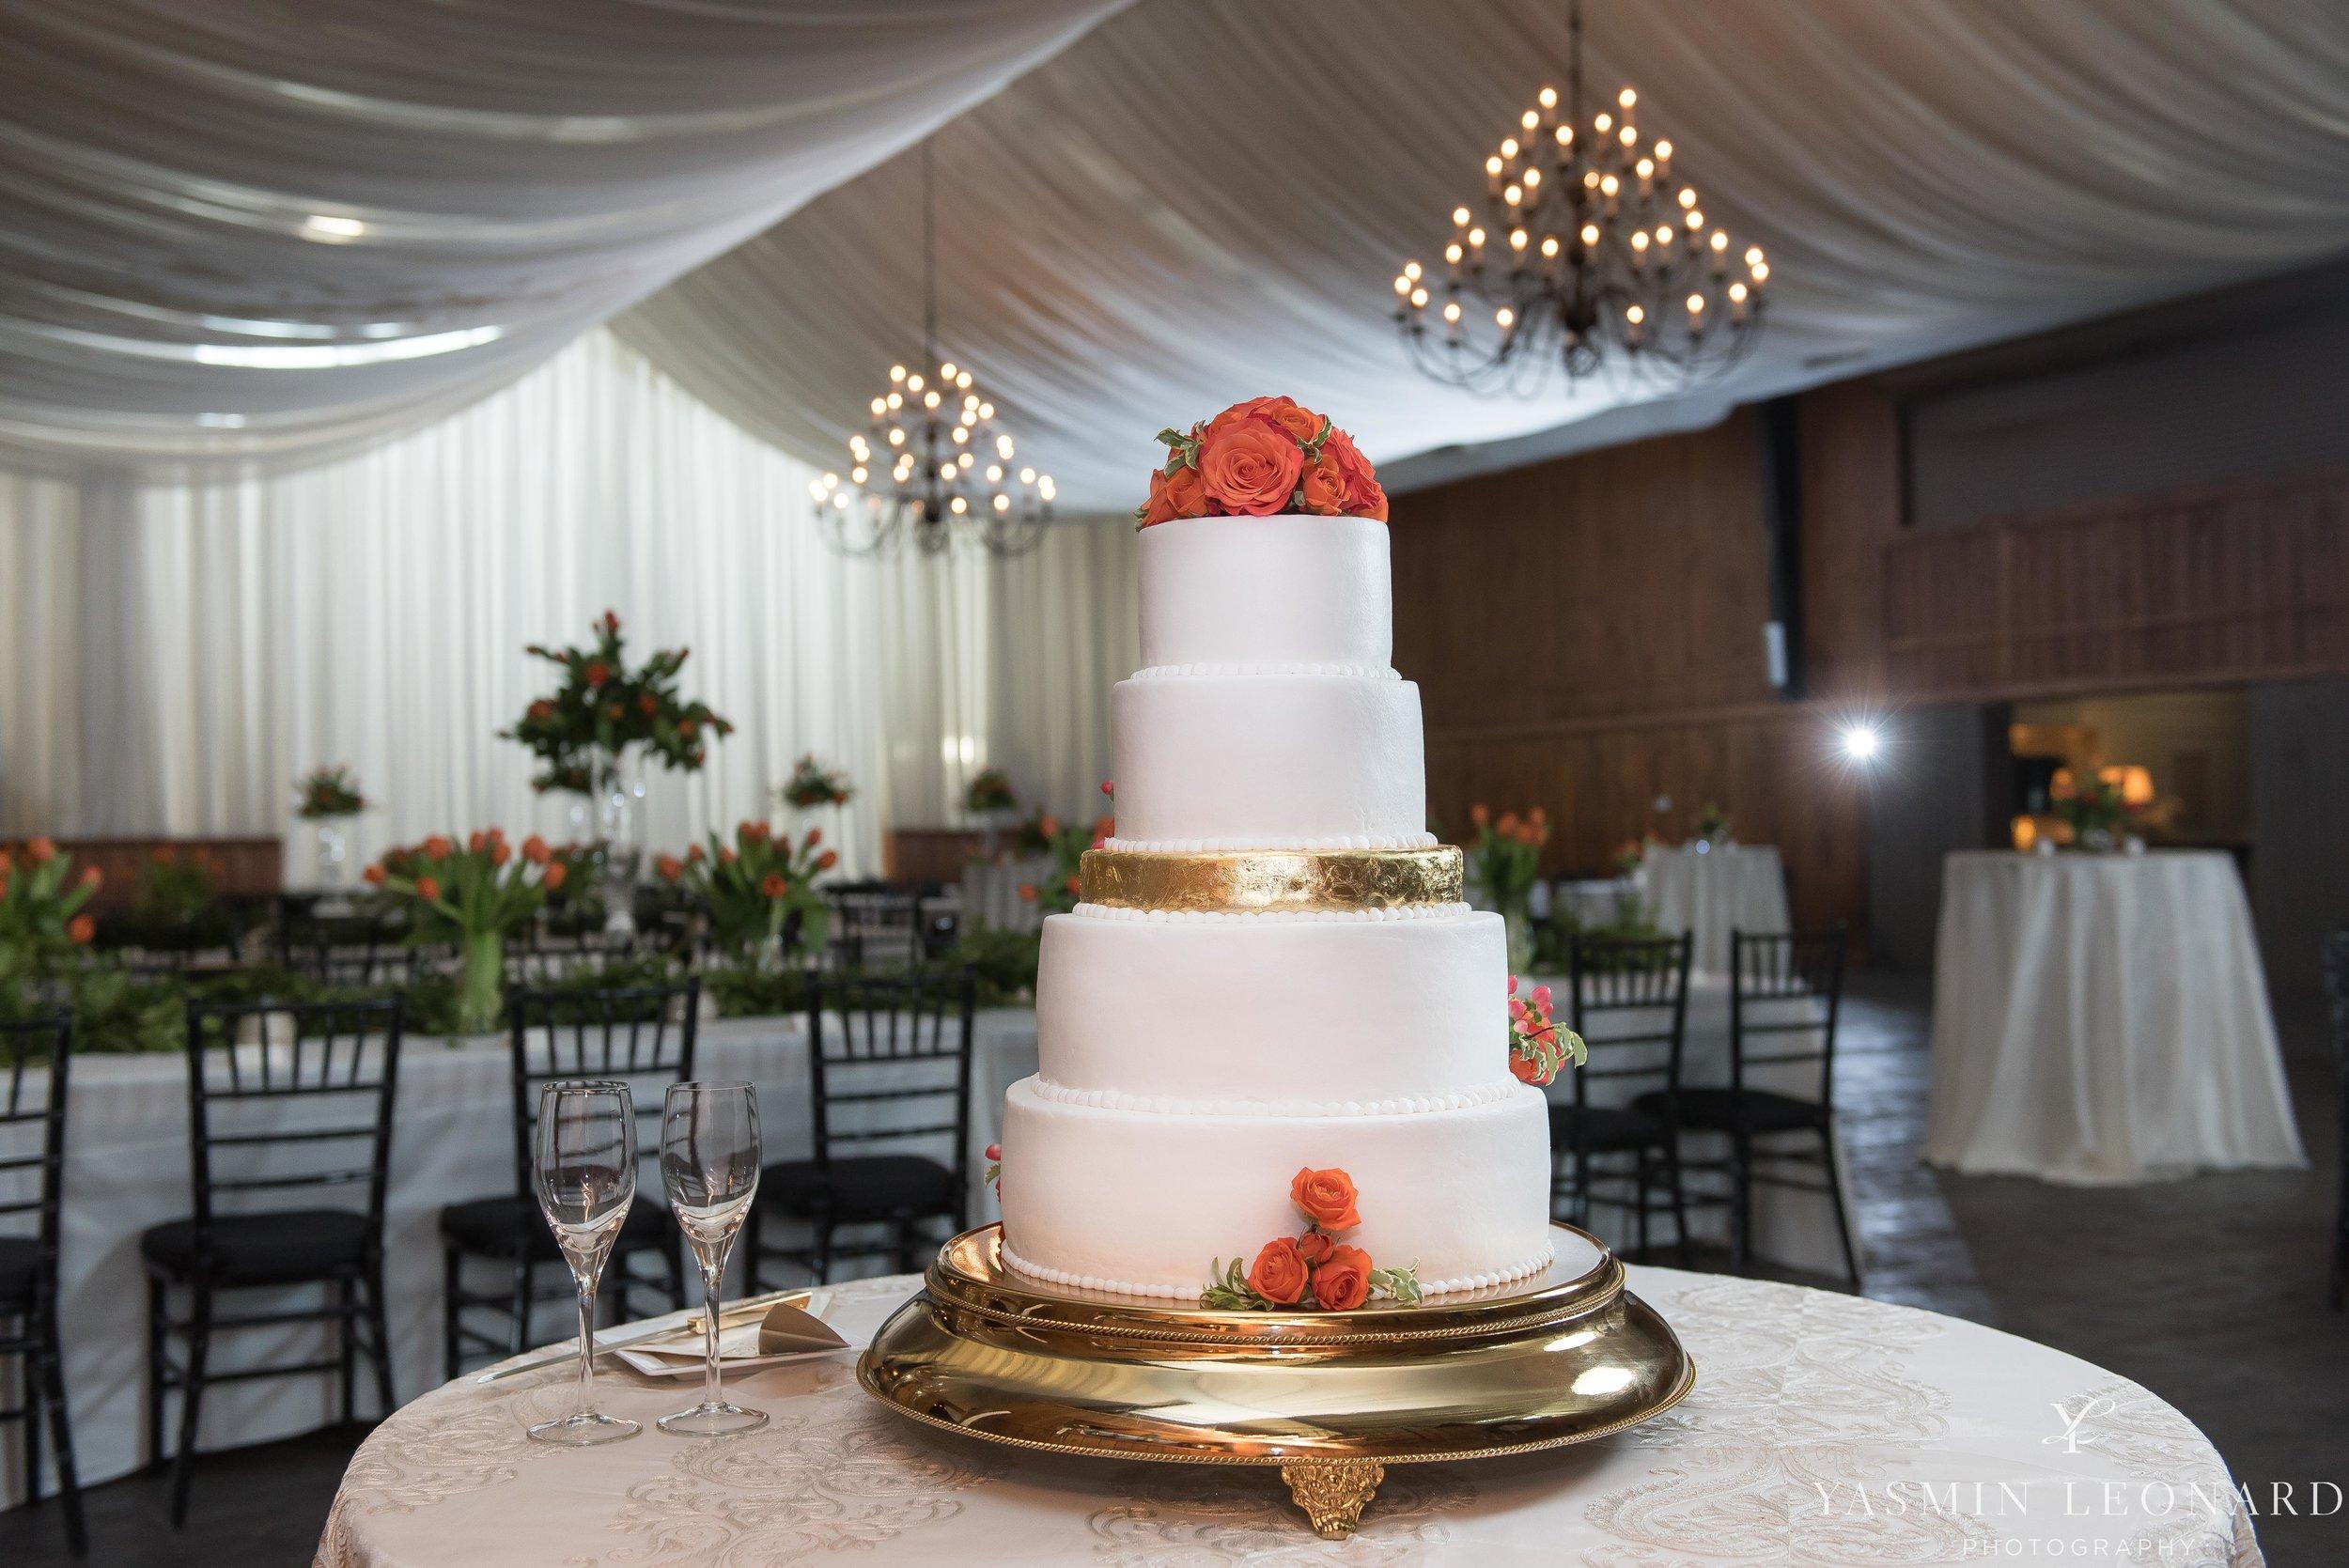 Adaumont Farm - Adaumont Farm Weddings - Trinity Weddings - NC Weddings - Yasmin Leonard Photography-23.jpg